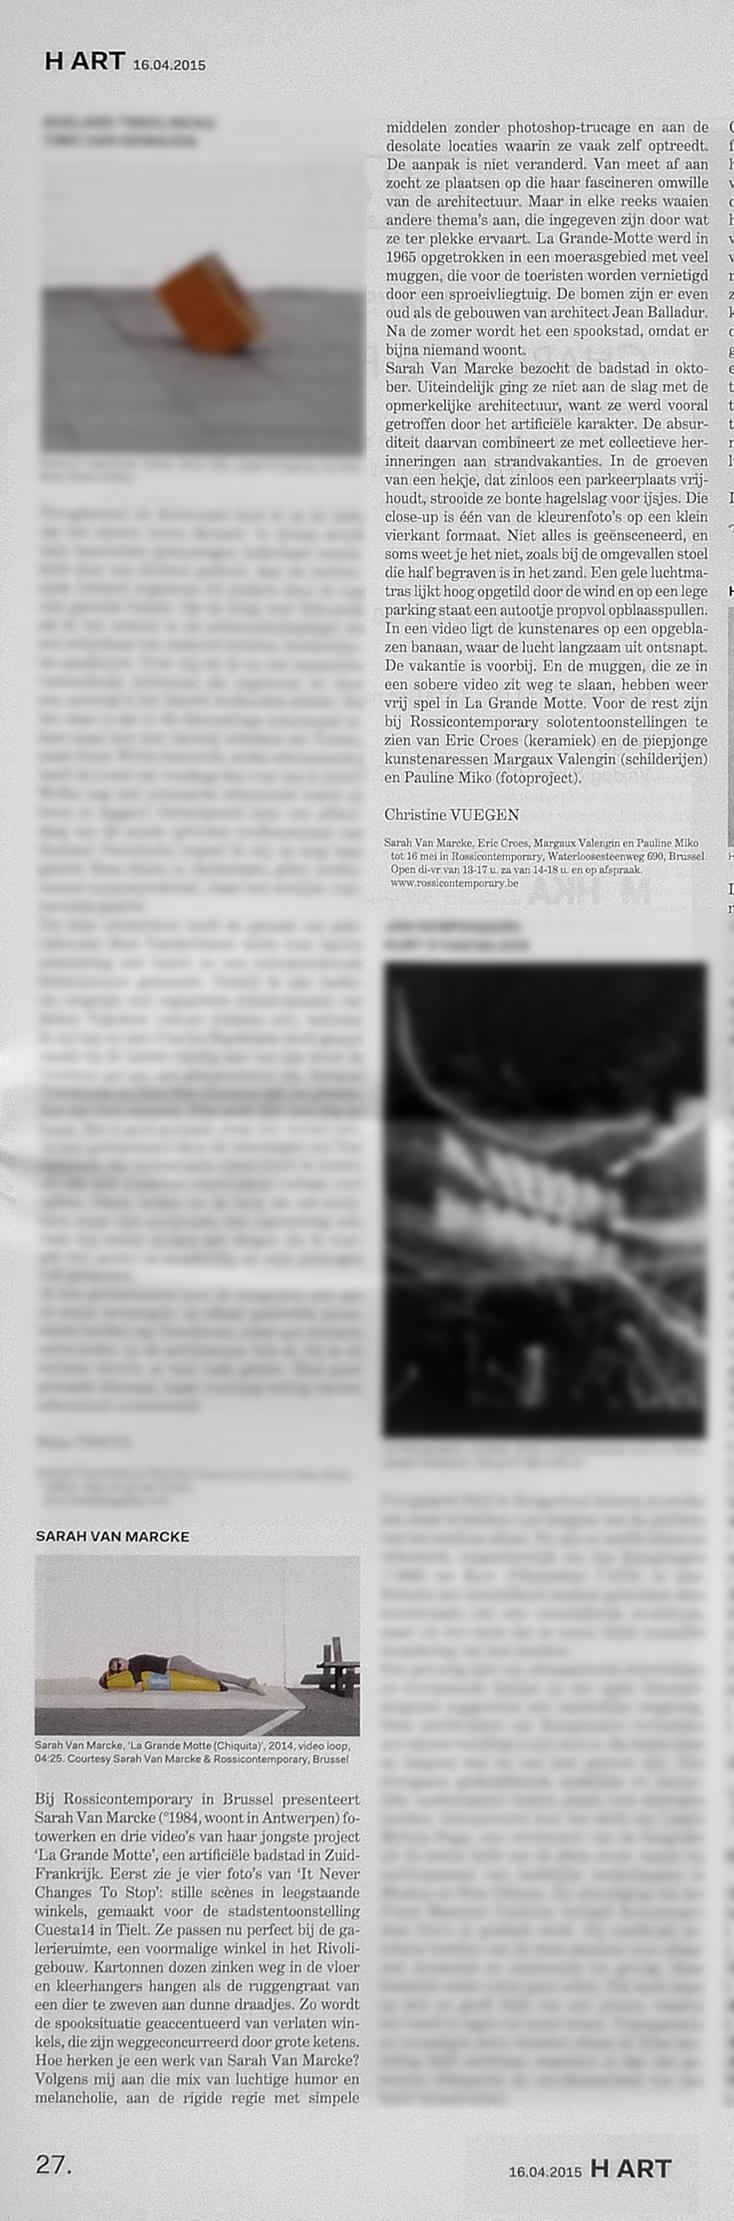 03 - Hart nr140- p27-text by Christine Vuegen.jpg